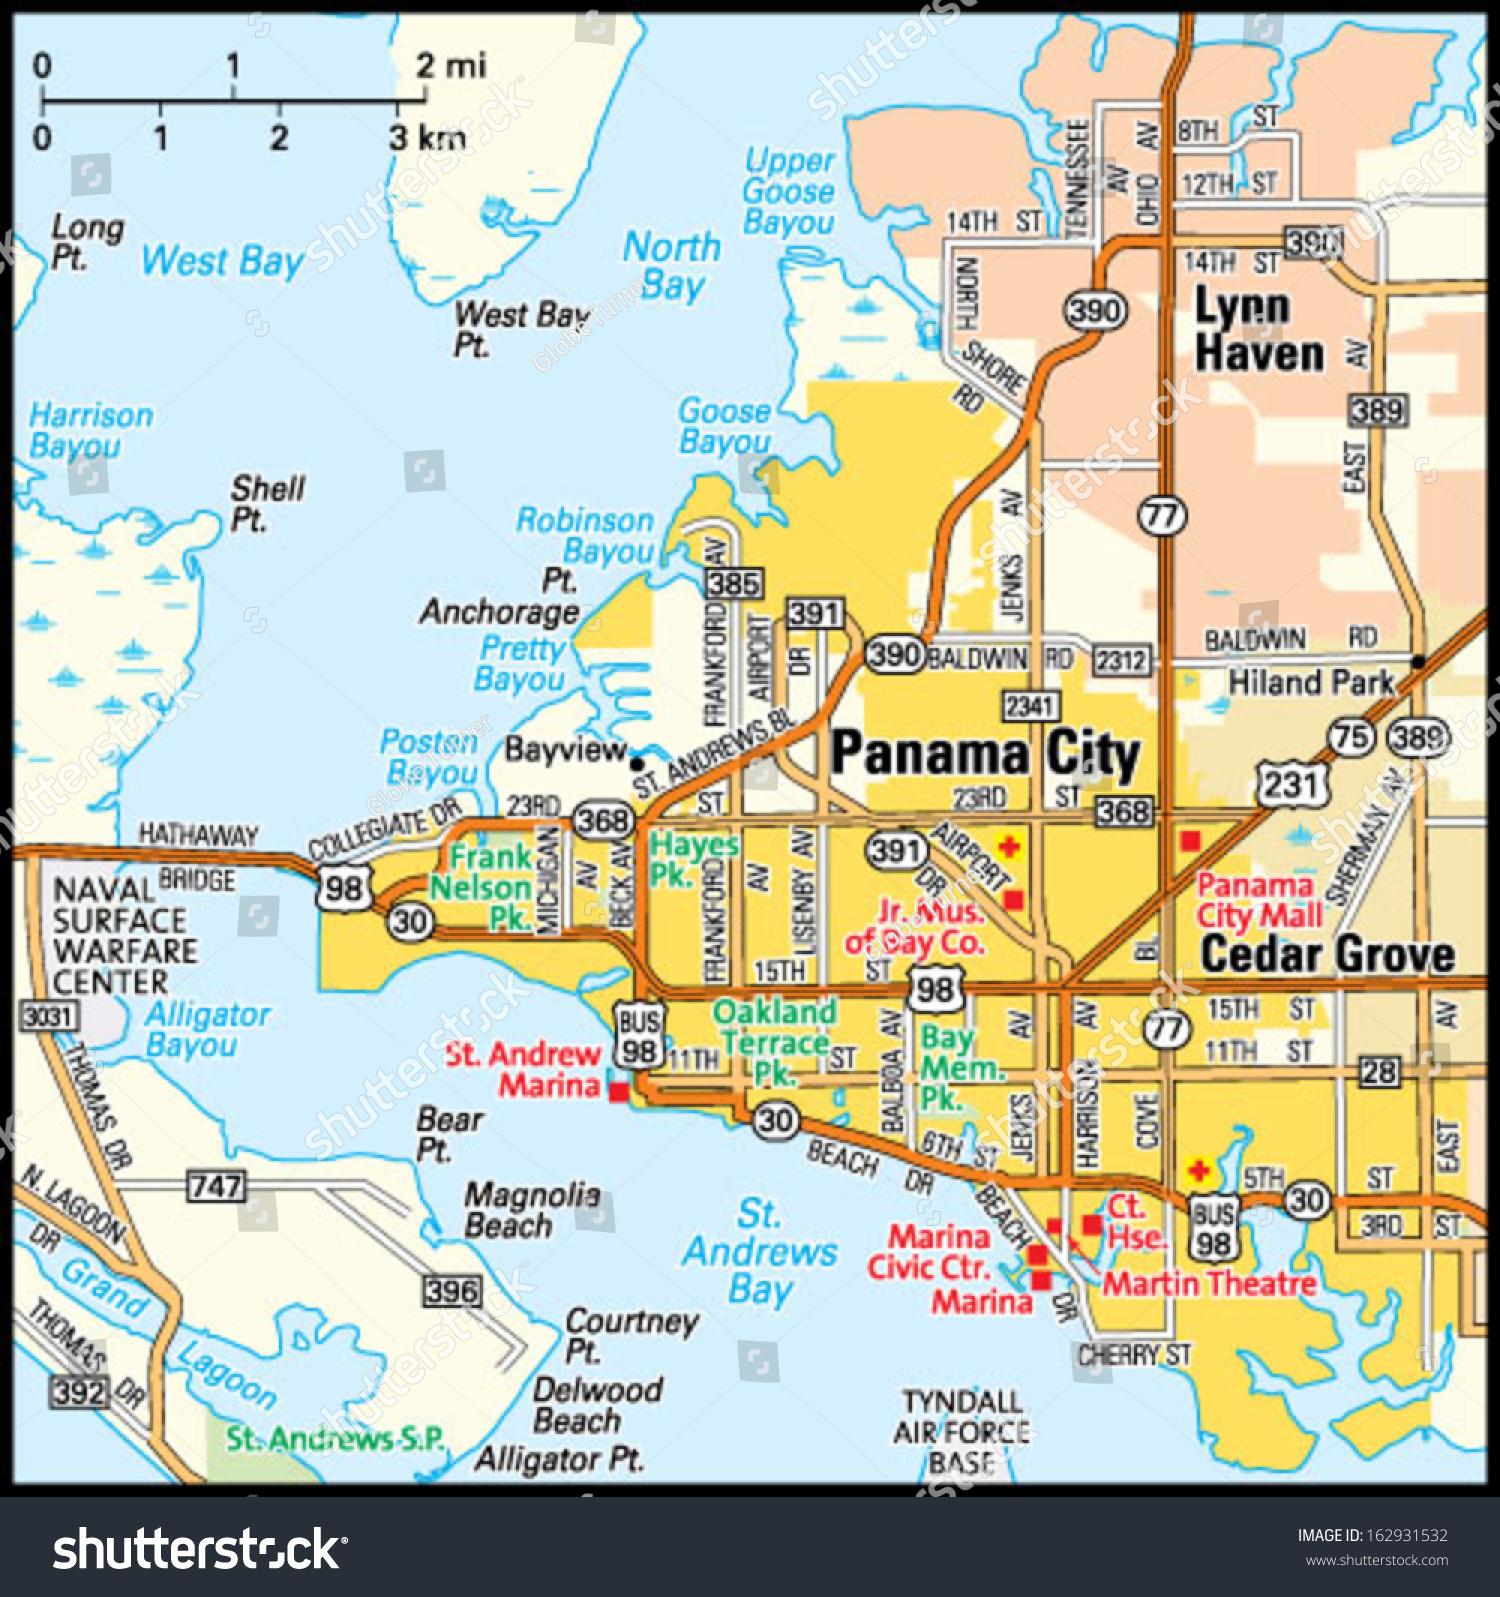 Panama City Florida Map From Image 1 - Ameliabd - Where Is Panama City Florida On The Map